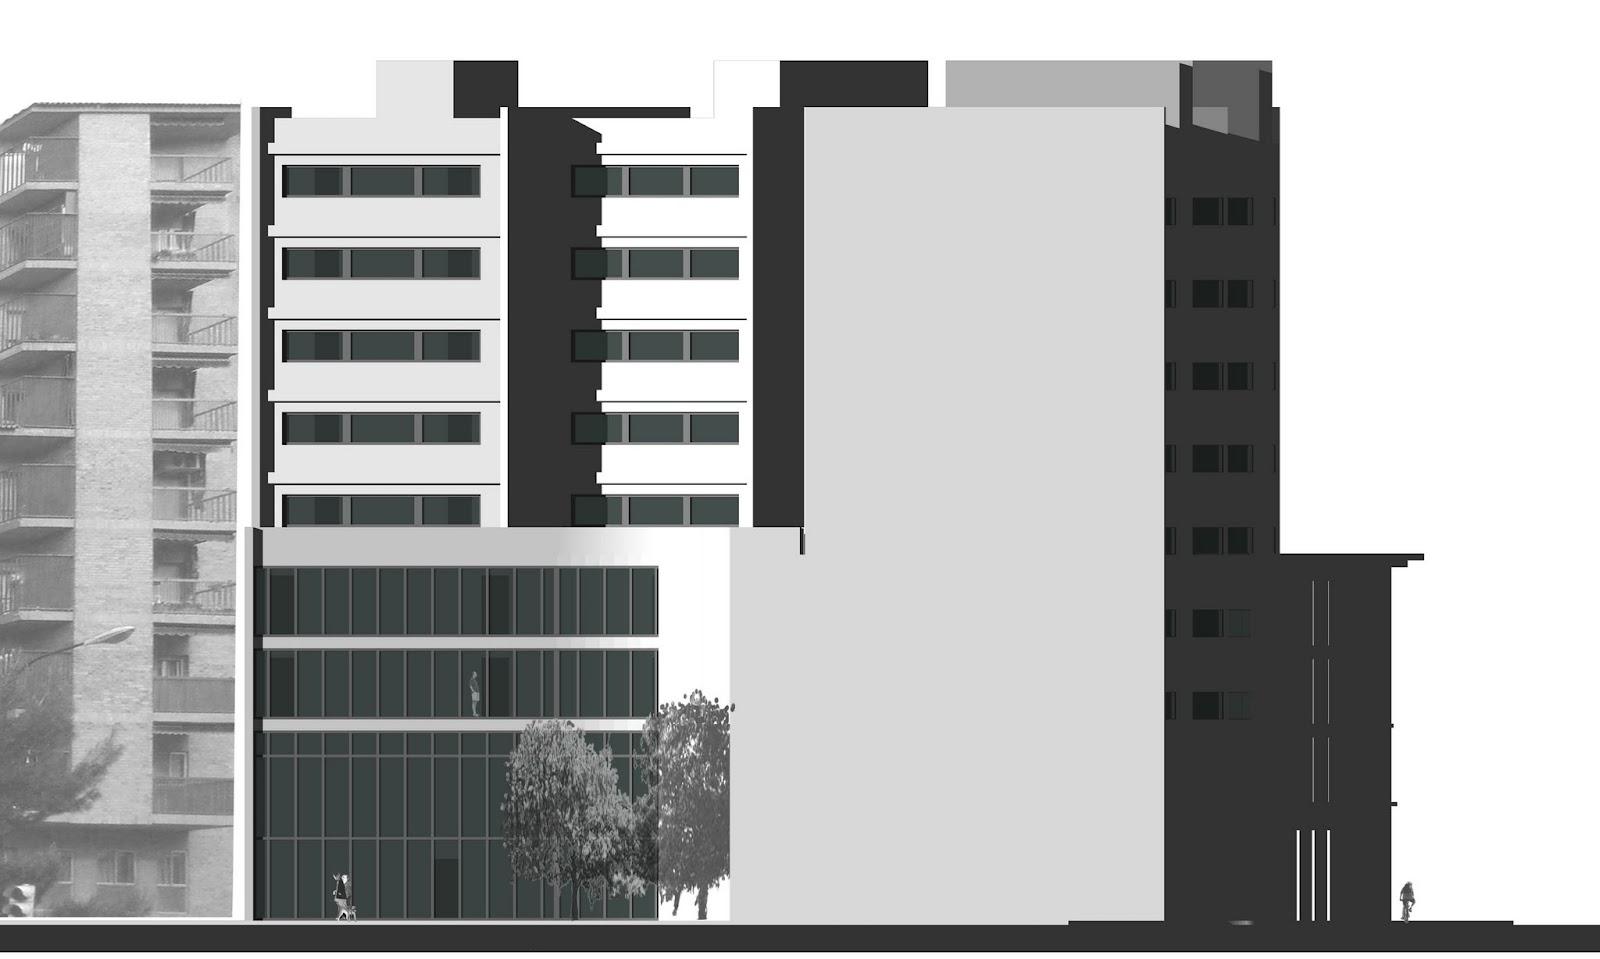 Maite lizarraga jgs 2 arquitectura virtual jgs for Arquitectura virtual